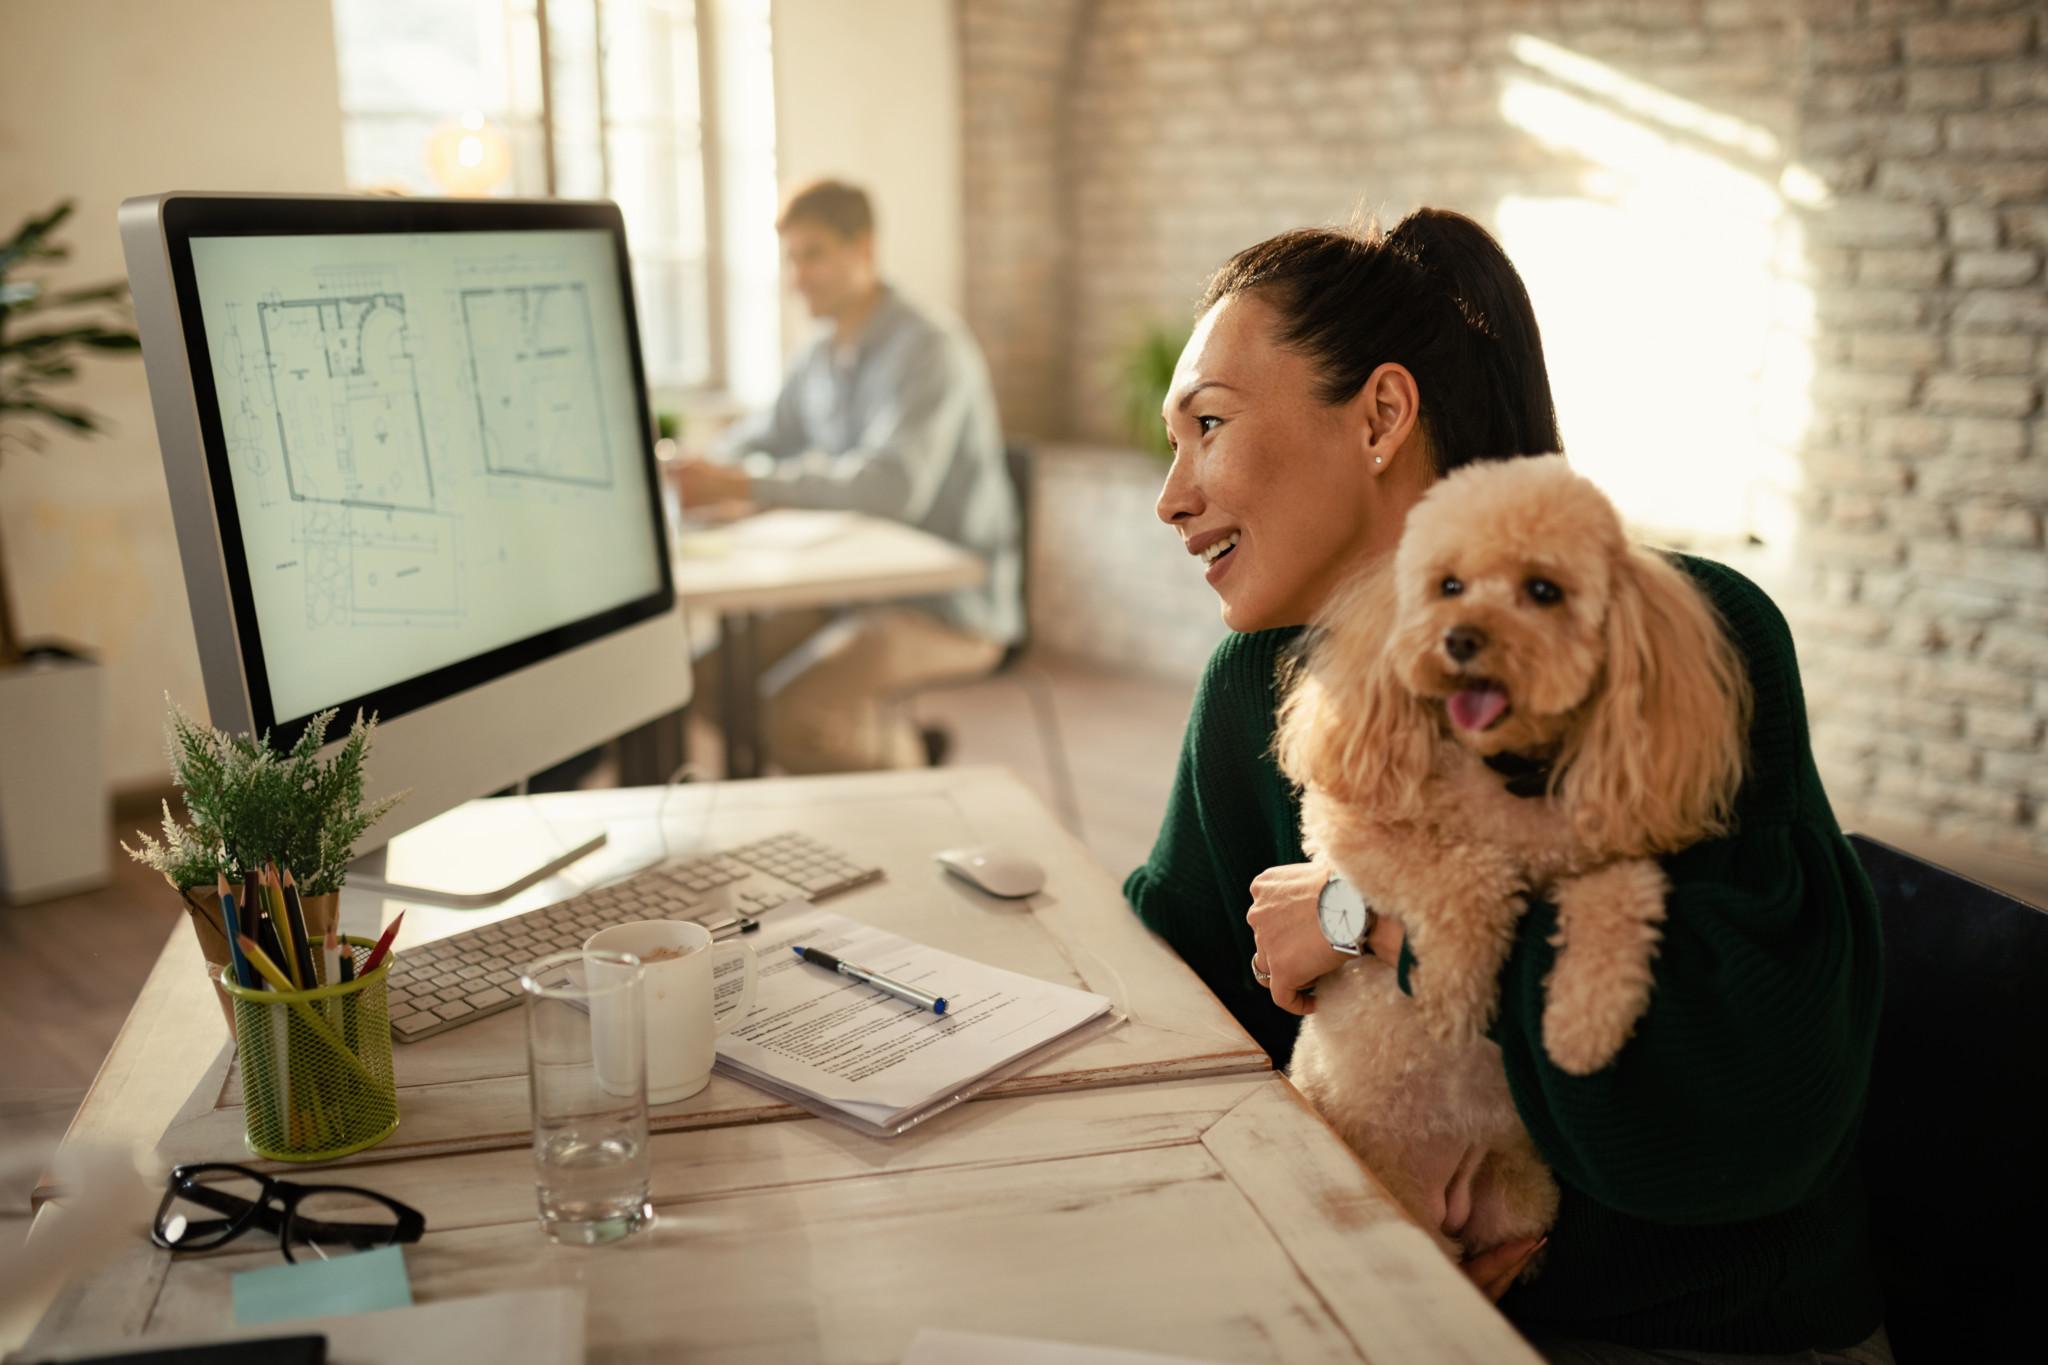 Pet friendly workplaces